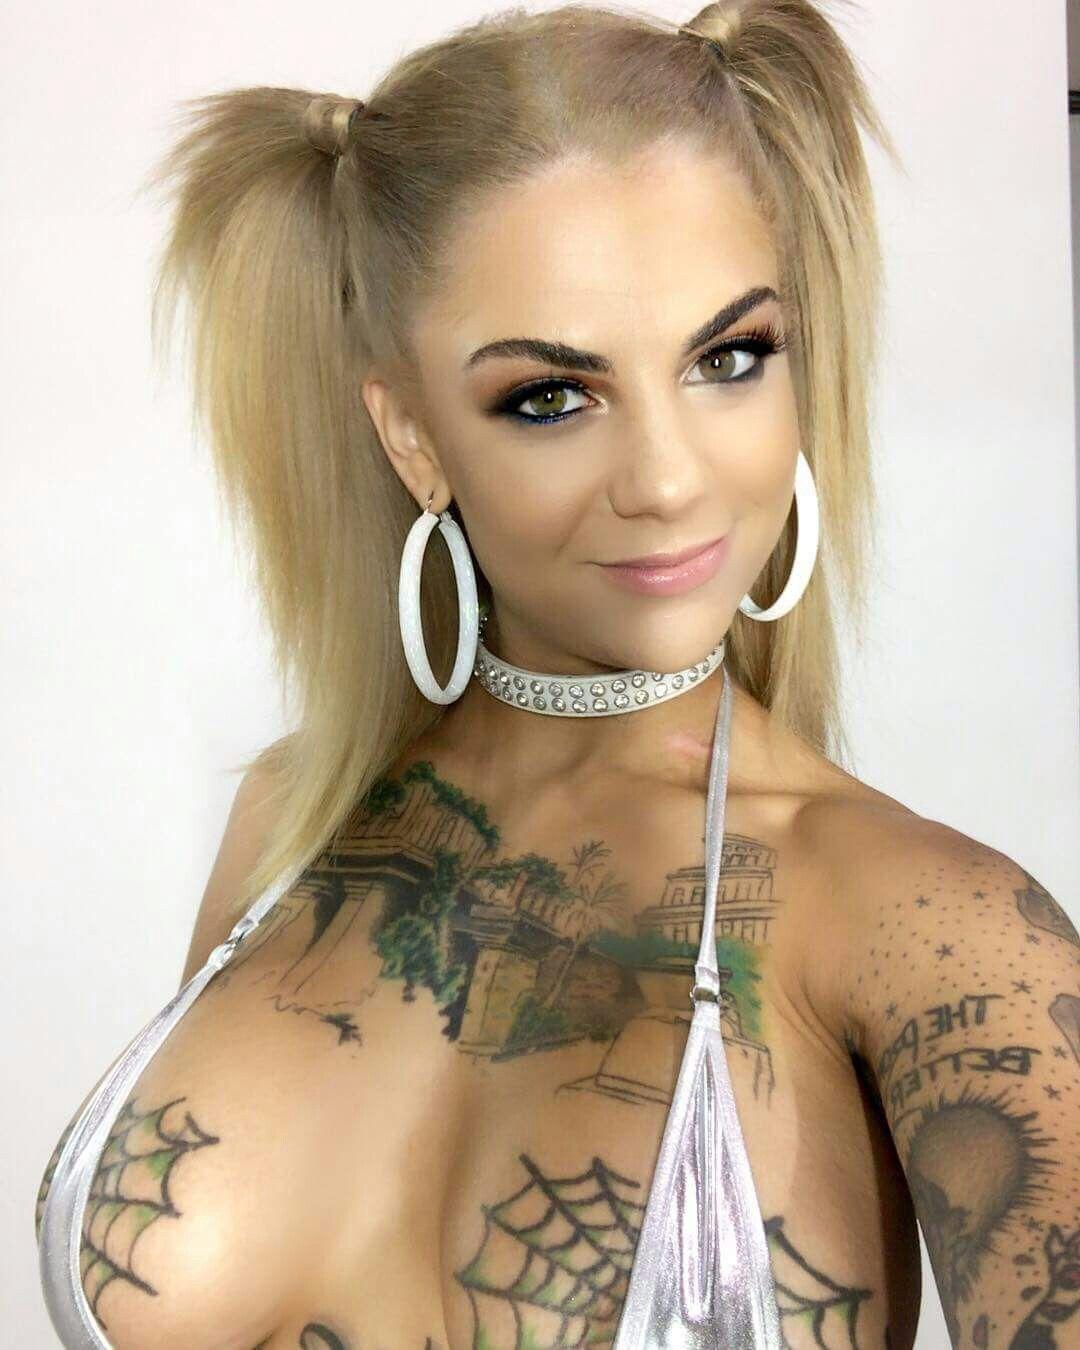 nud small pusy orgasm